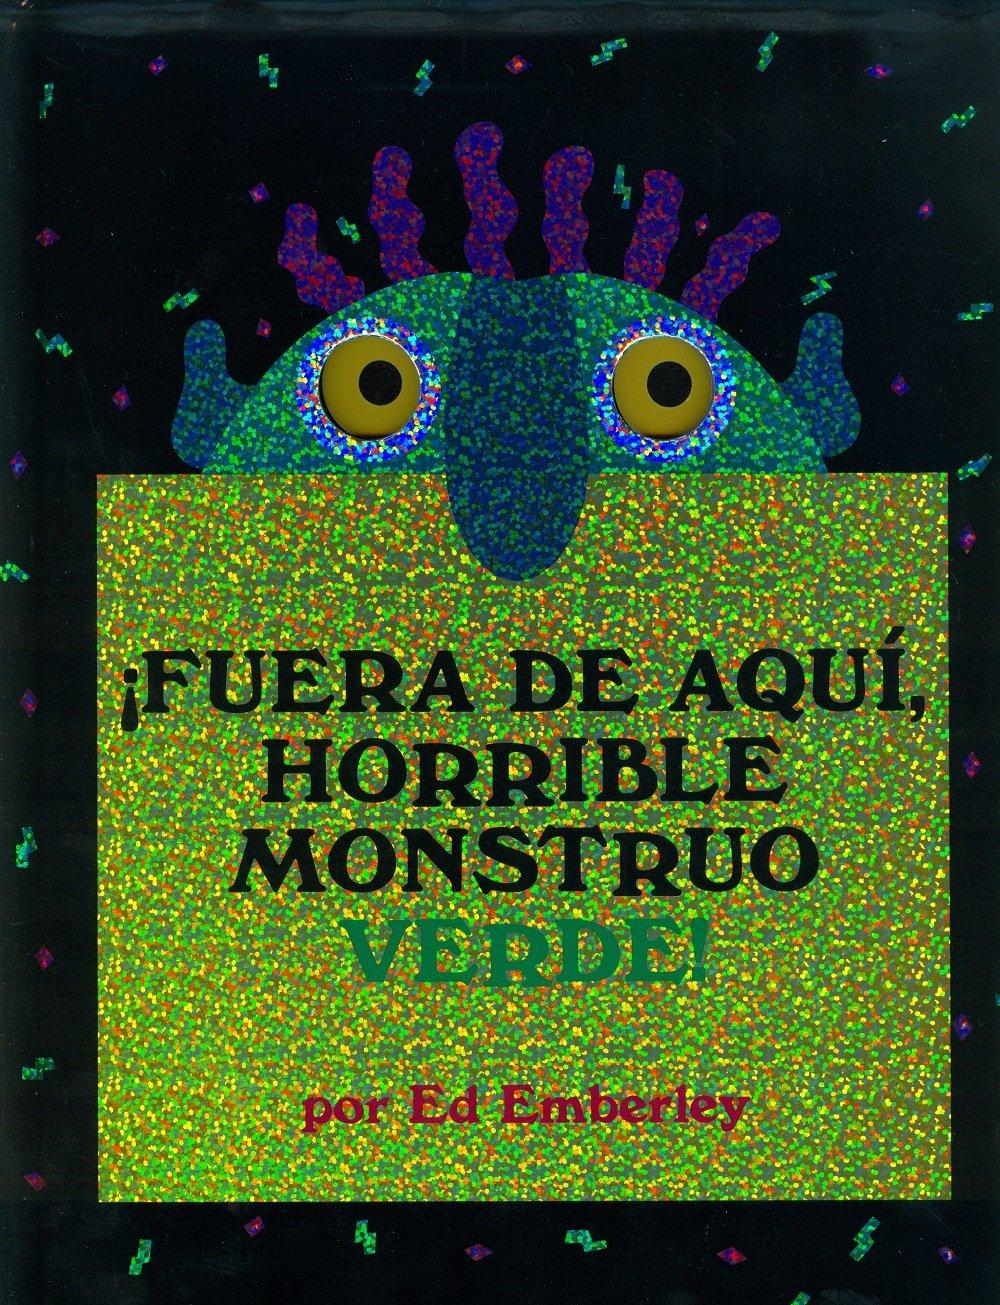 Read Online Fuera de aqui, horrible monstruo verde!/ Go Away, Big Green Monster! (Oceano Travesia) (Spanish Edition) PDF